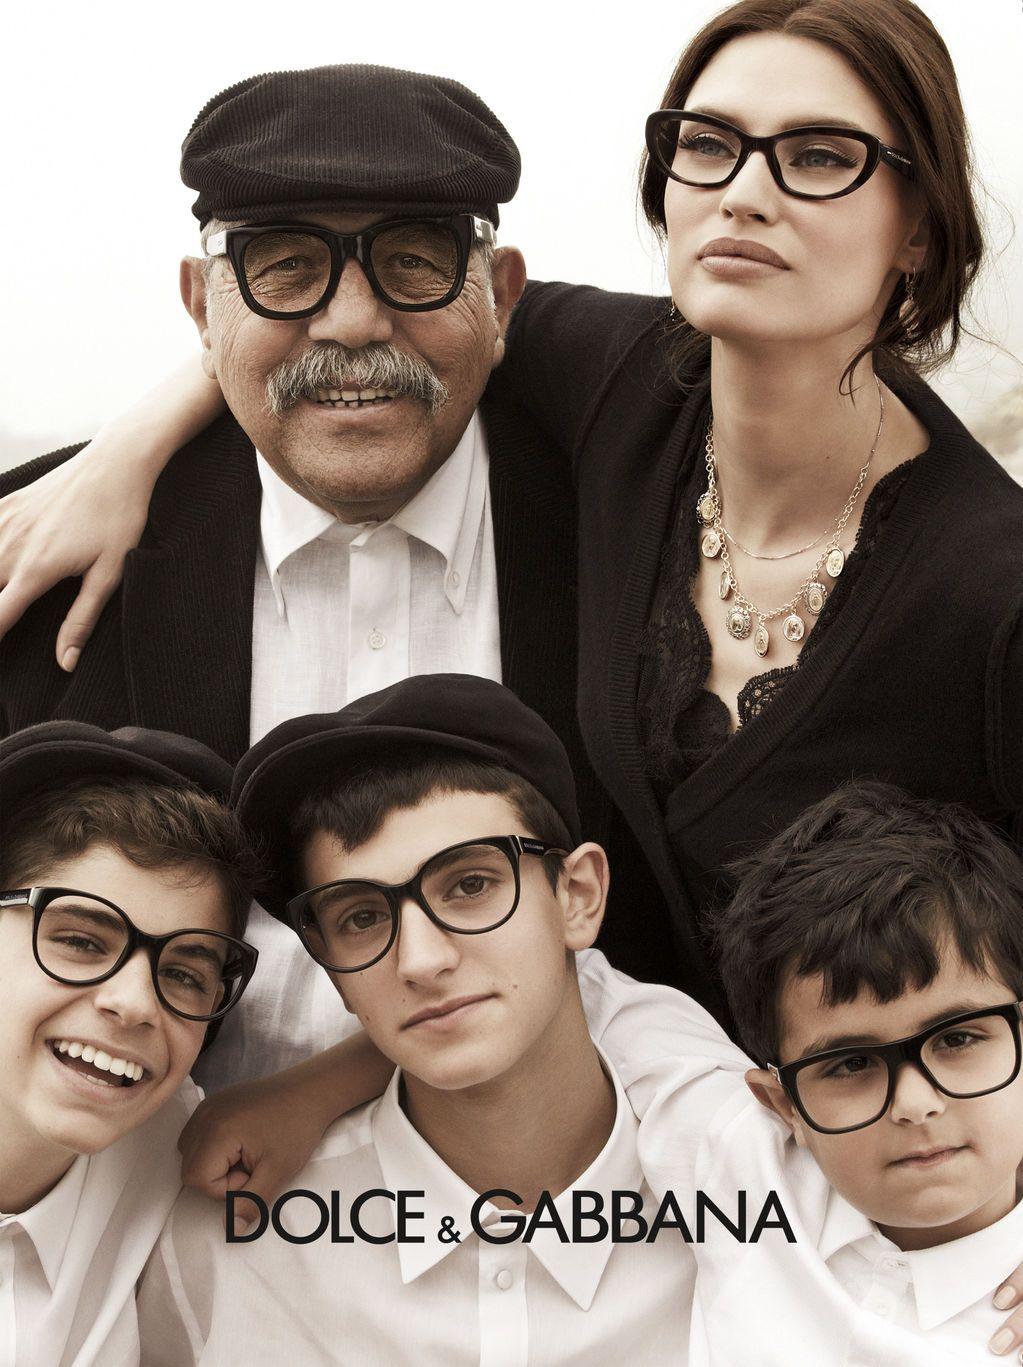 Bianca Balti for Dolce & Gabbana Eyewear by Giampaolo Sgura ...